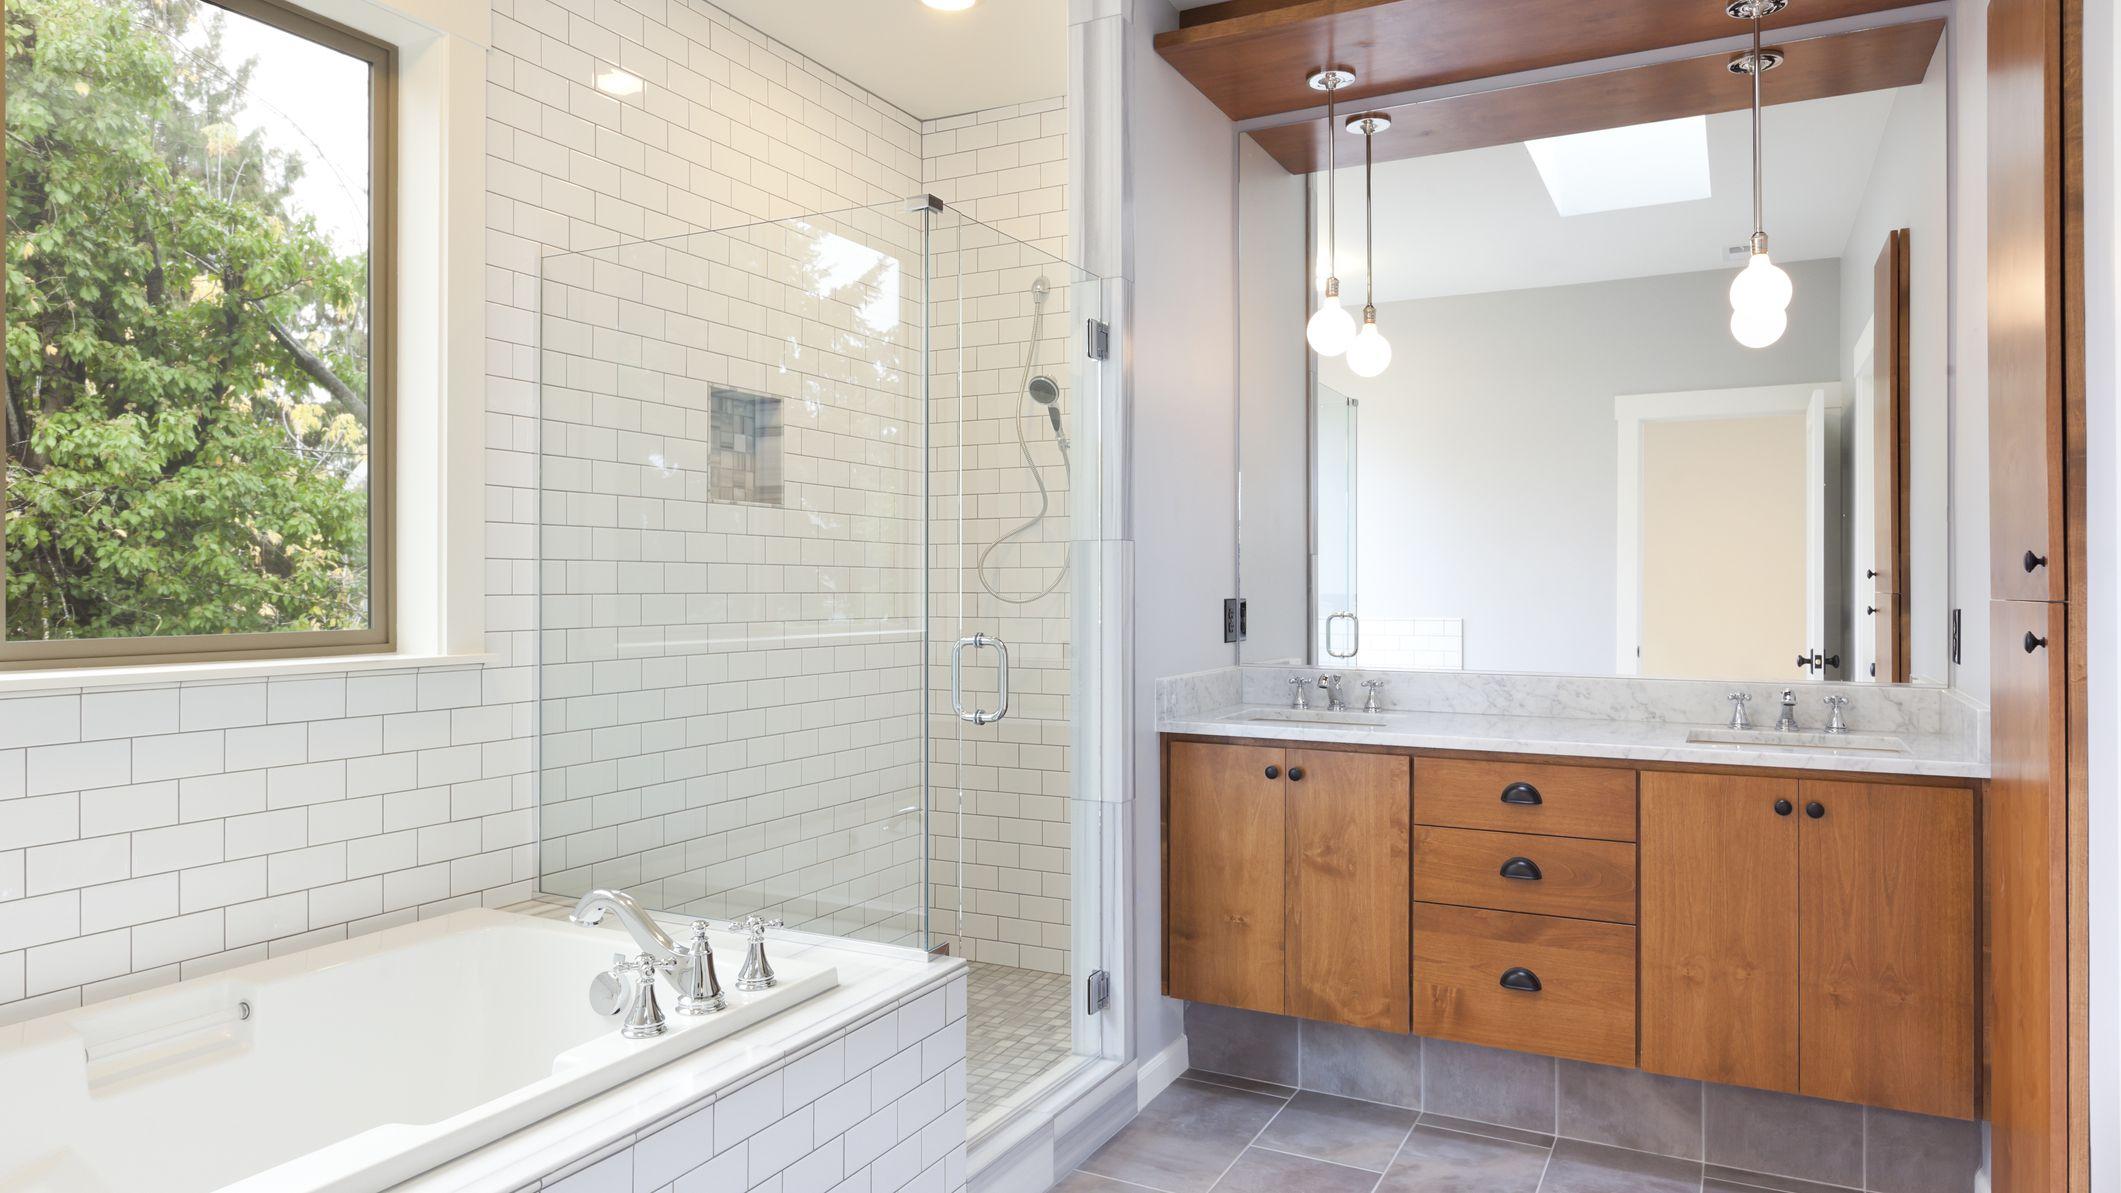 bathroom vanity cabinets and sinks